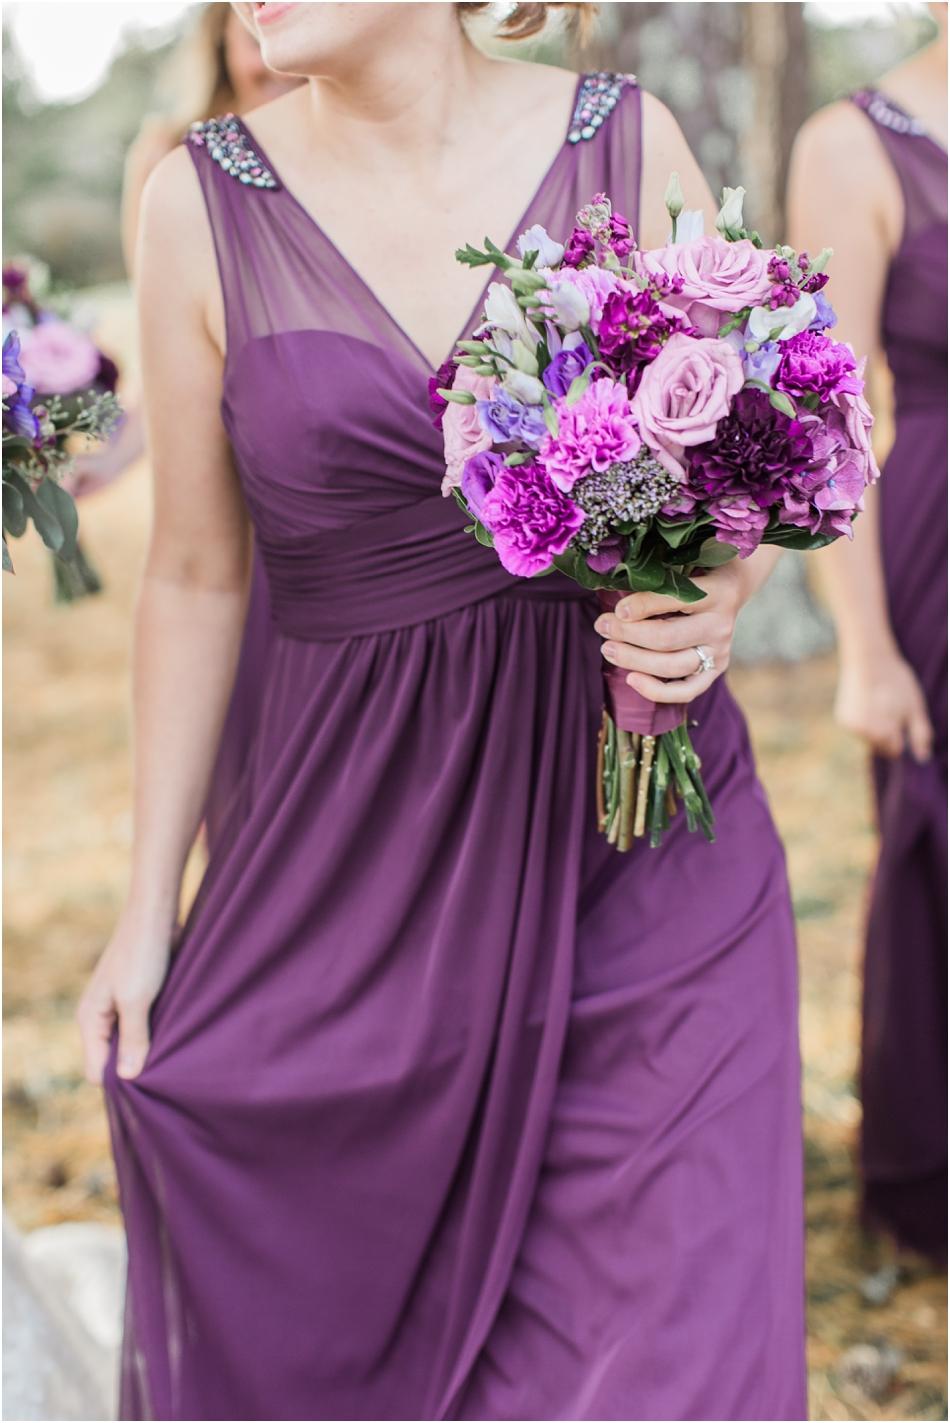 willowbend_megan_david_country_club_cape_cod_boston_new_england_wedding_photographer_Meredith_Jane_Photography_photo_0199.jpg